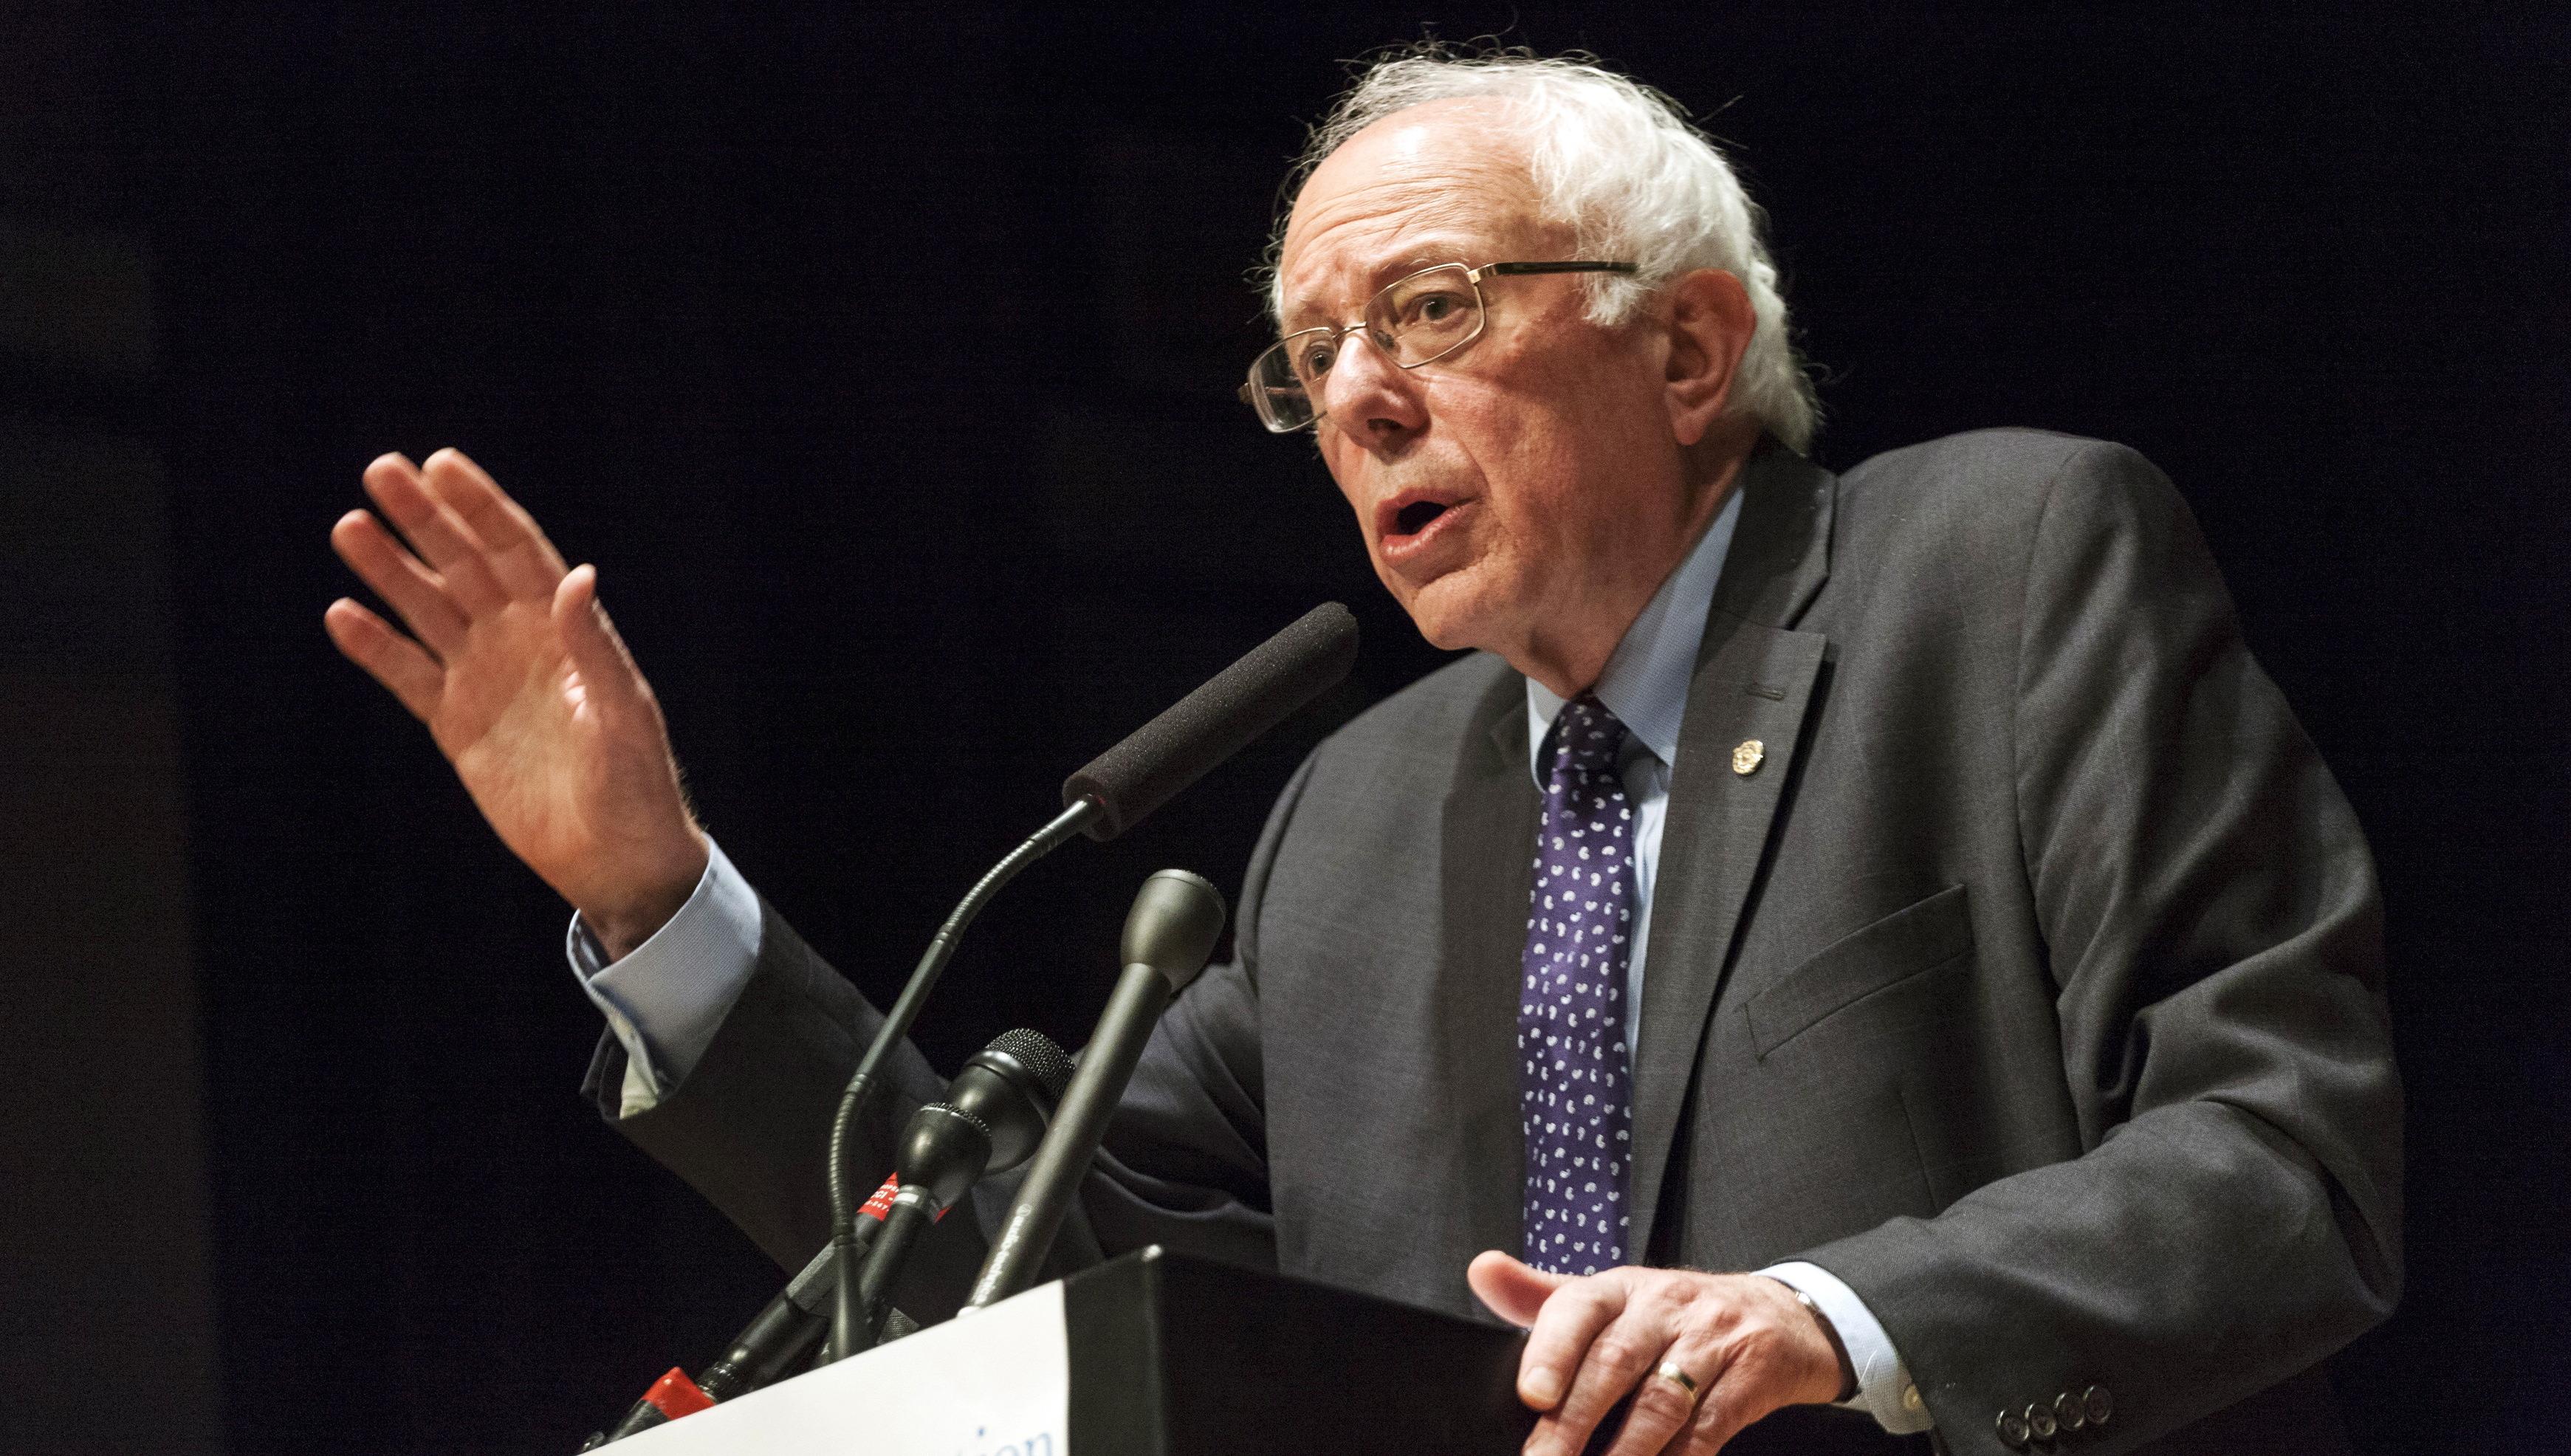 U.S. Democratic presidential candidate Bernie Sanders speaks at The Caspe Terrace, a Jewish community center in Waukee